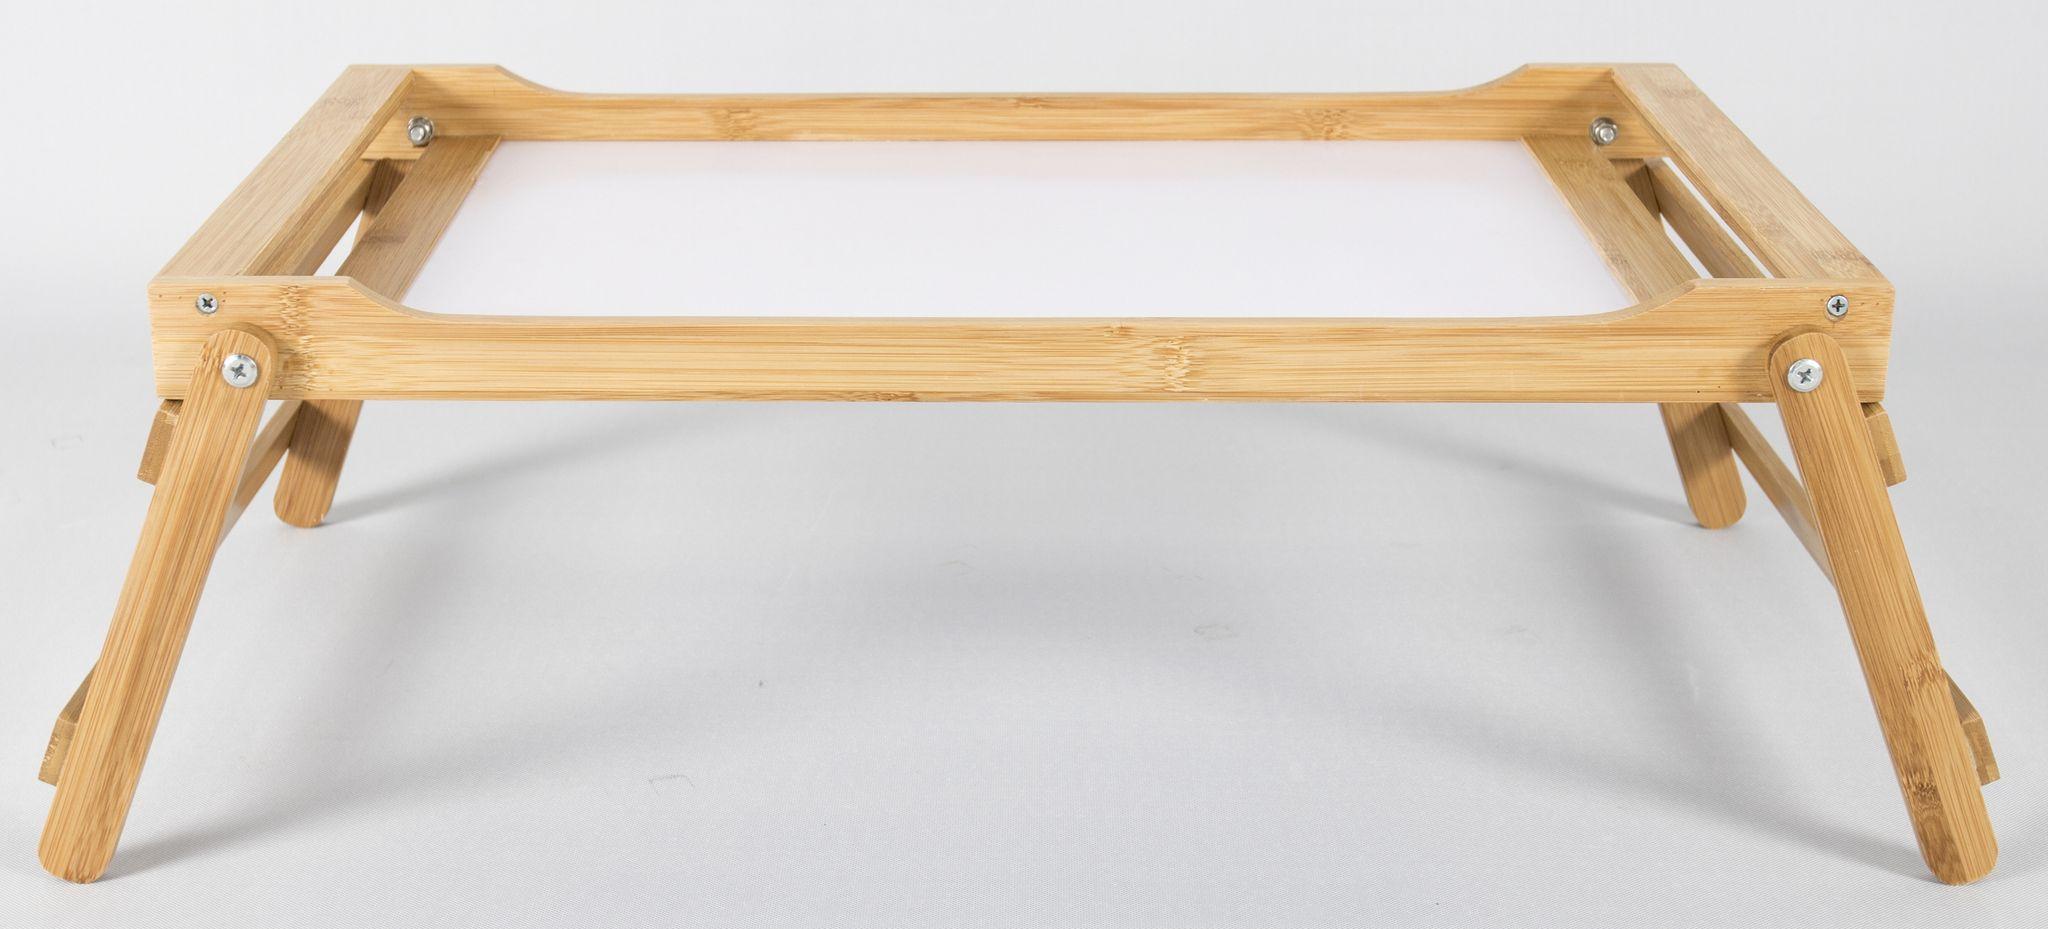 tablett bett bambus elbm bel landhausm bel. Black Bedroom Furniture Sets. Home Design Ideas